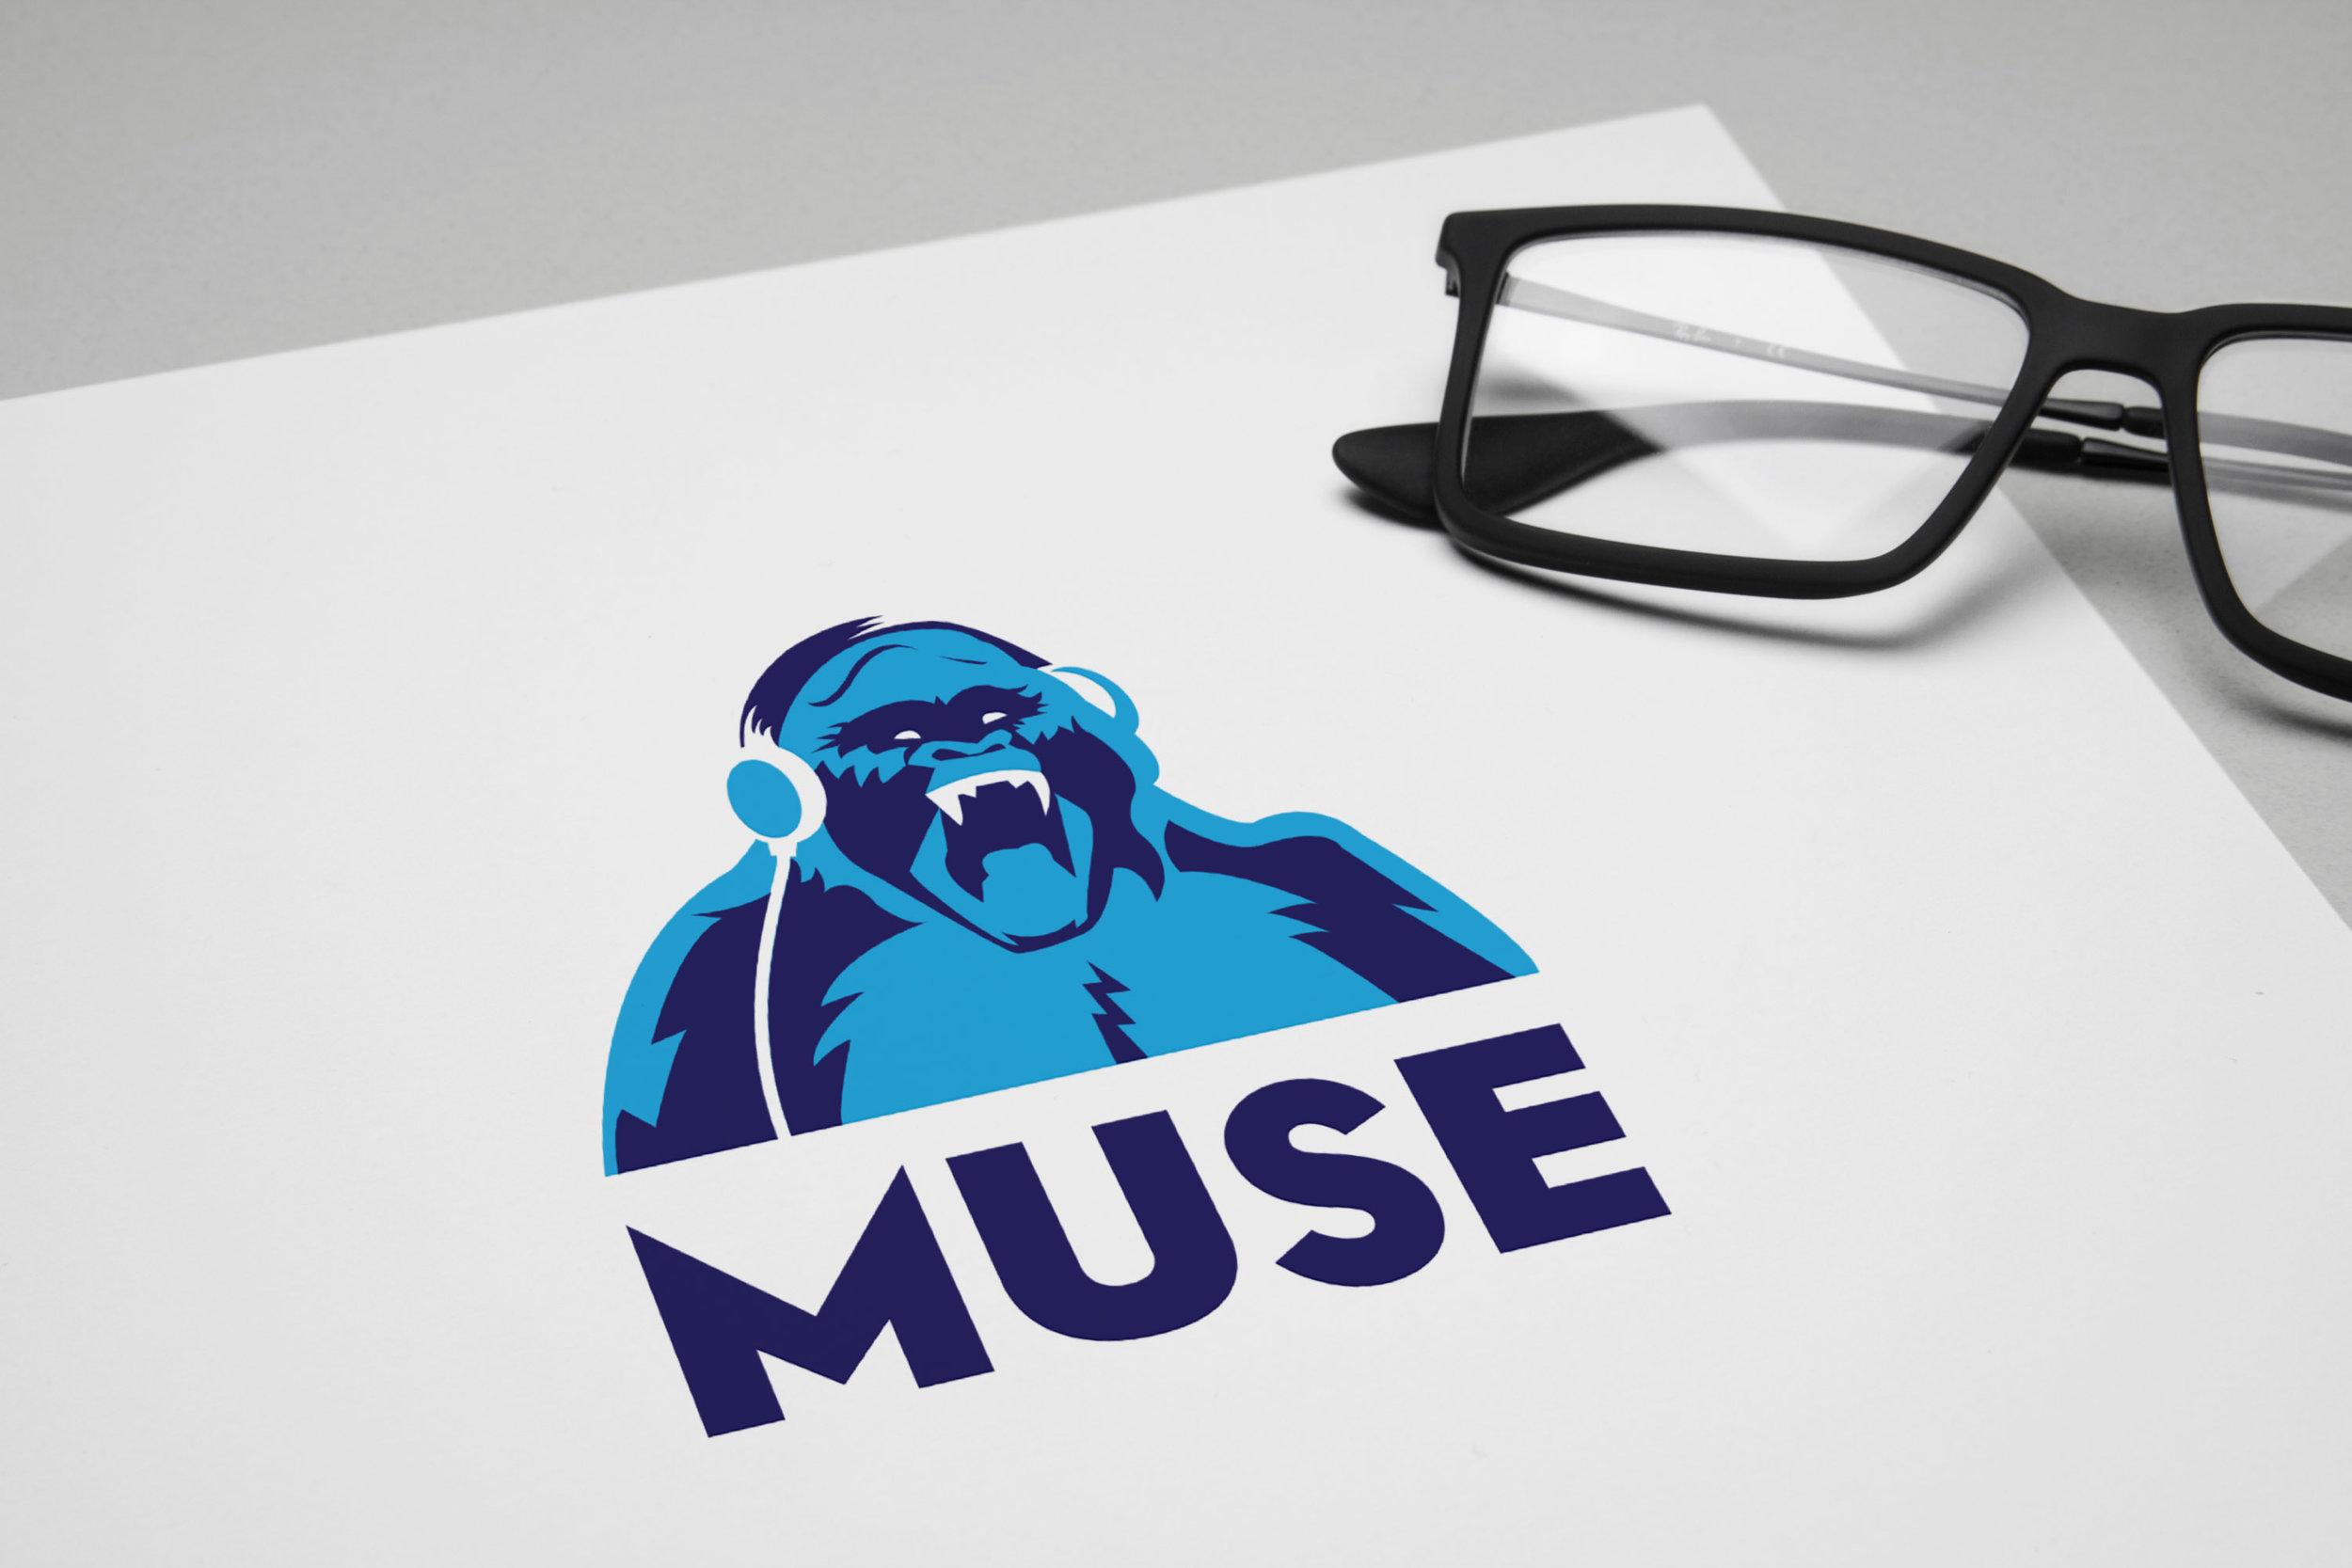 gorillamuse-logo-mockup.jpg